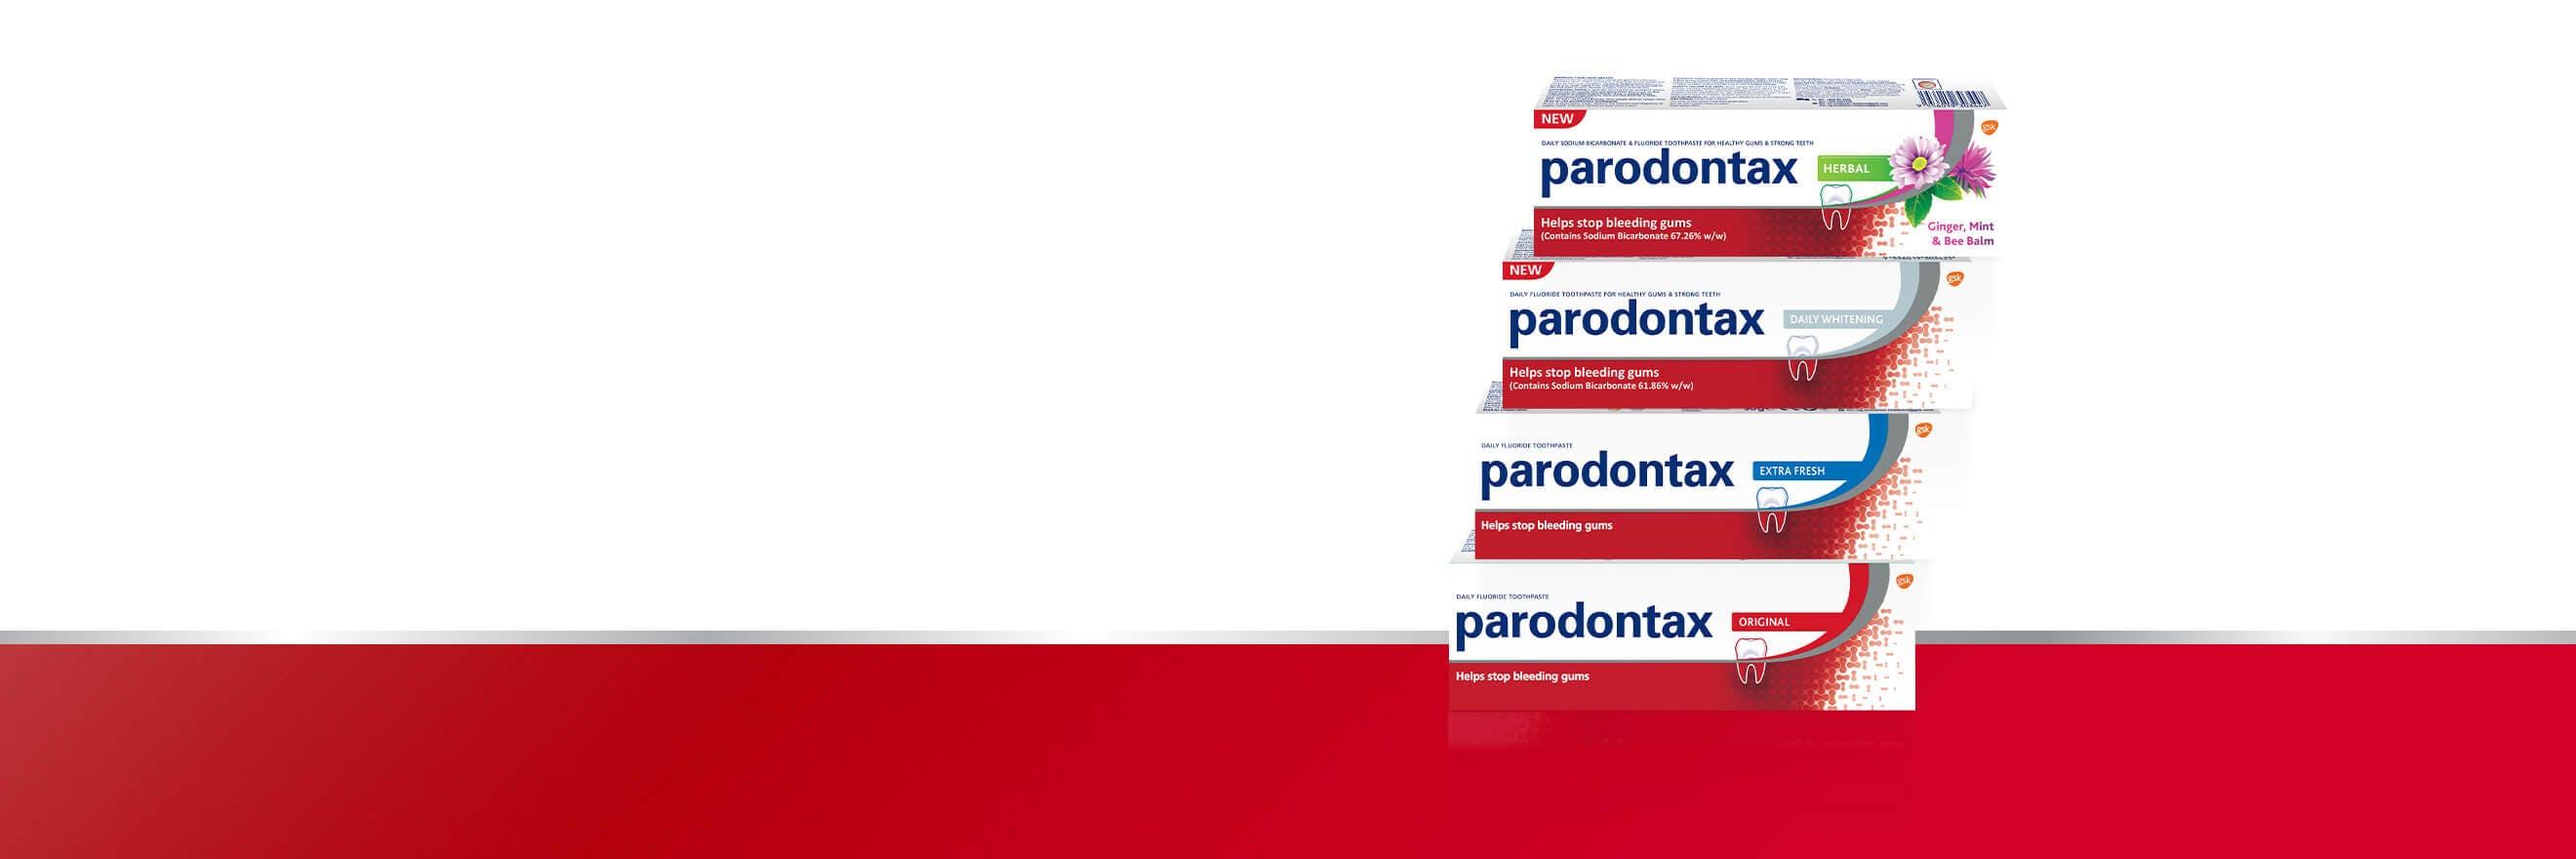 parodontax Ultra Clean Toothpaste